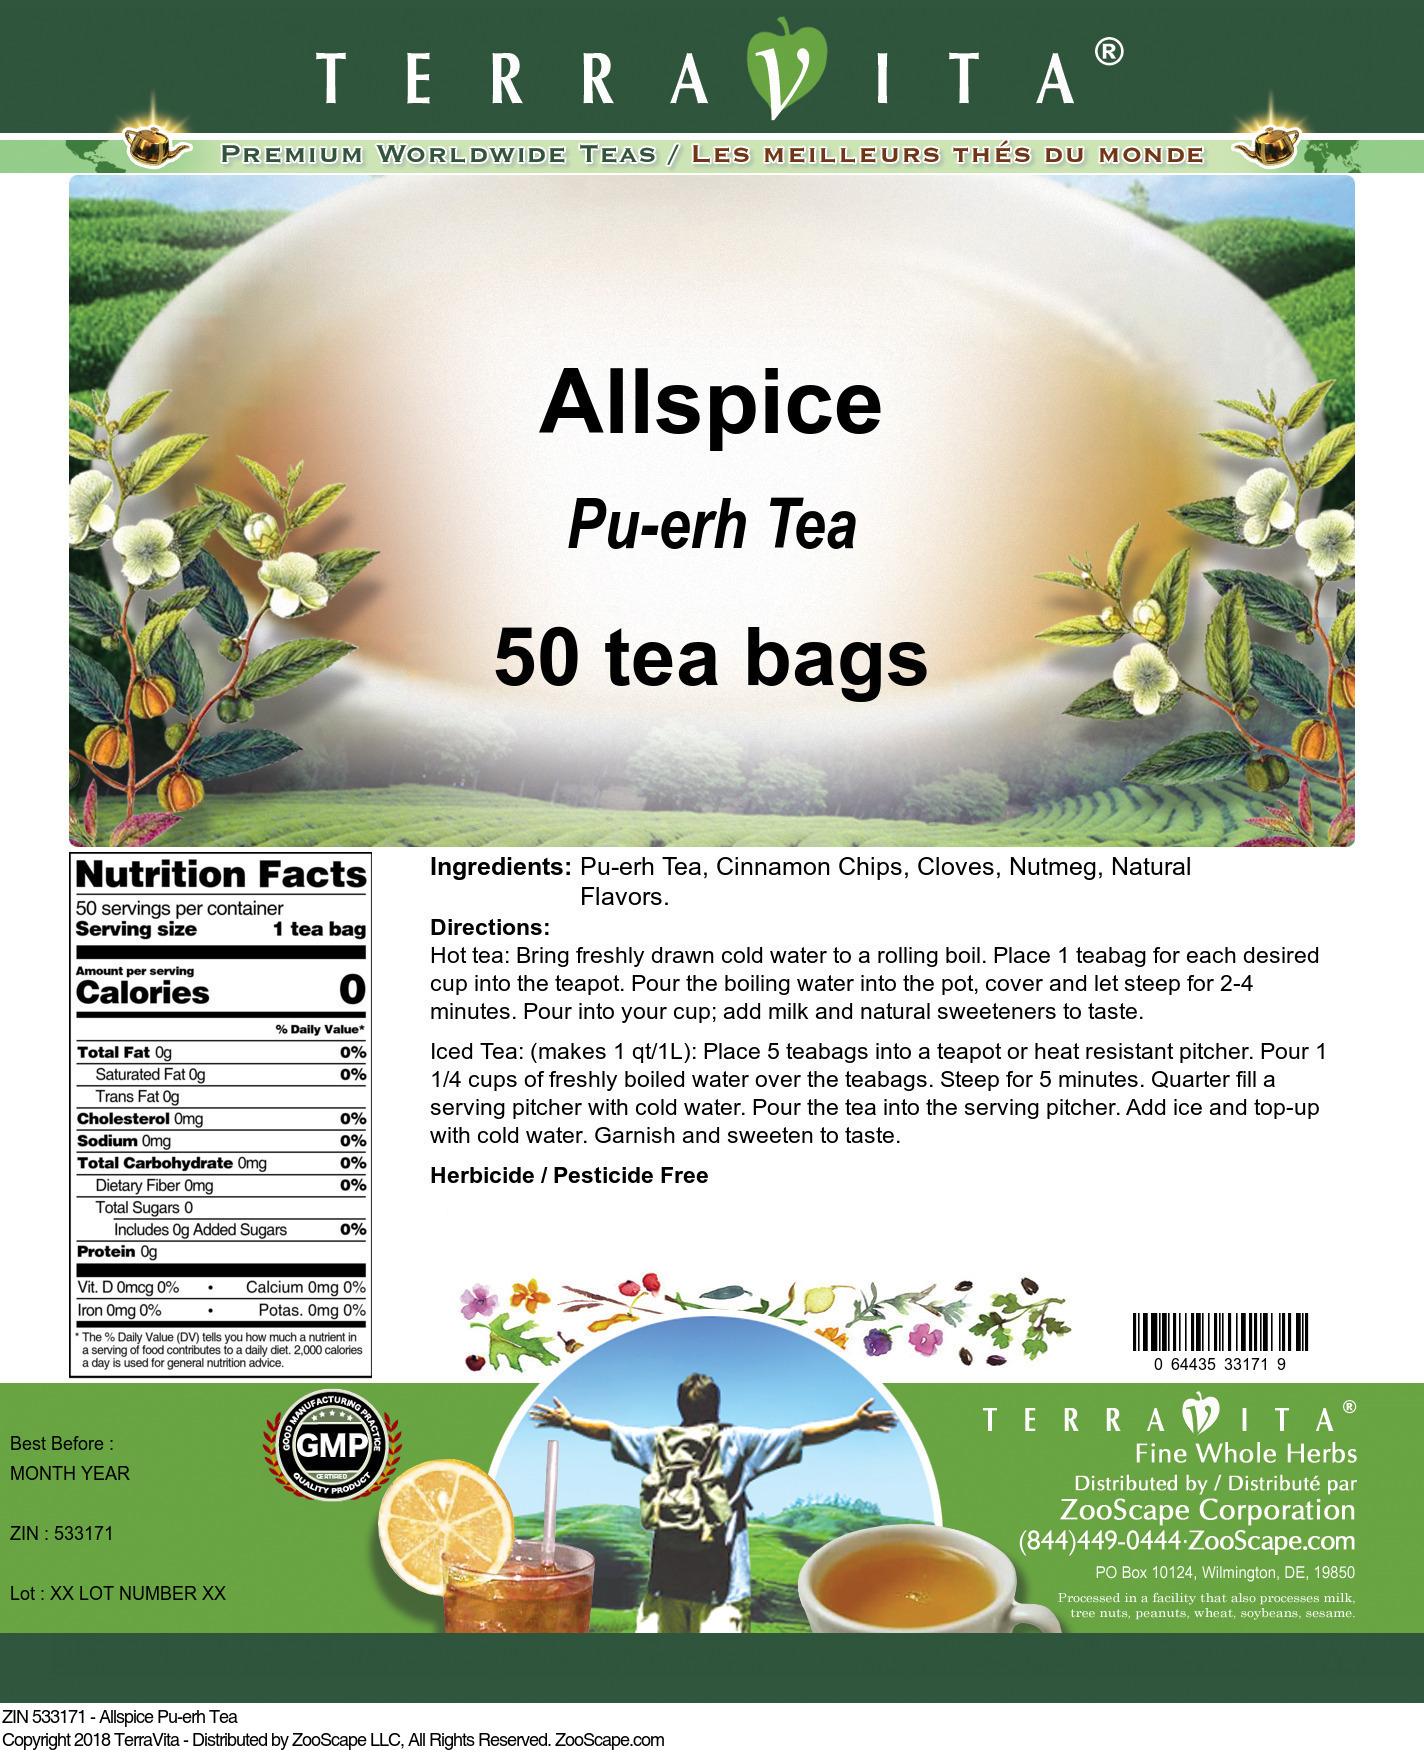 Allspice Pu-erh Tea